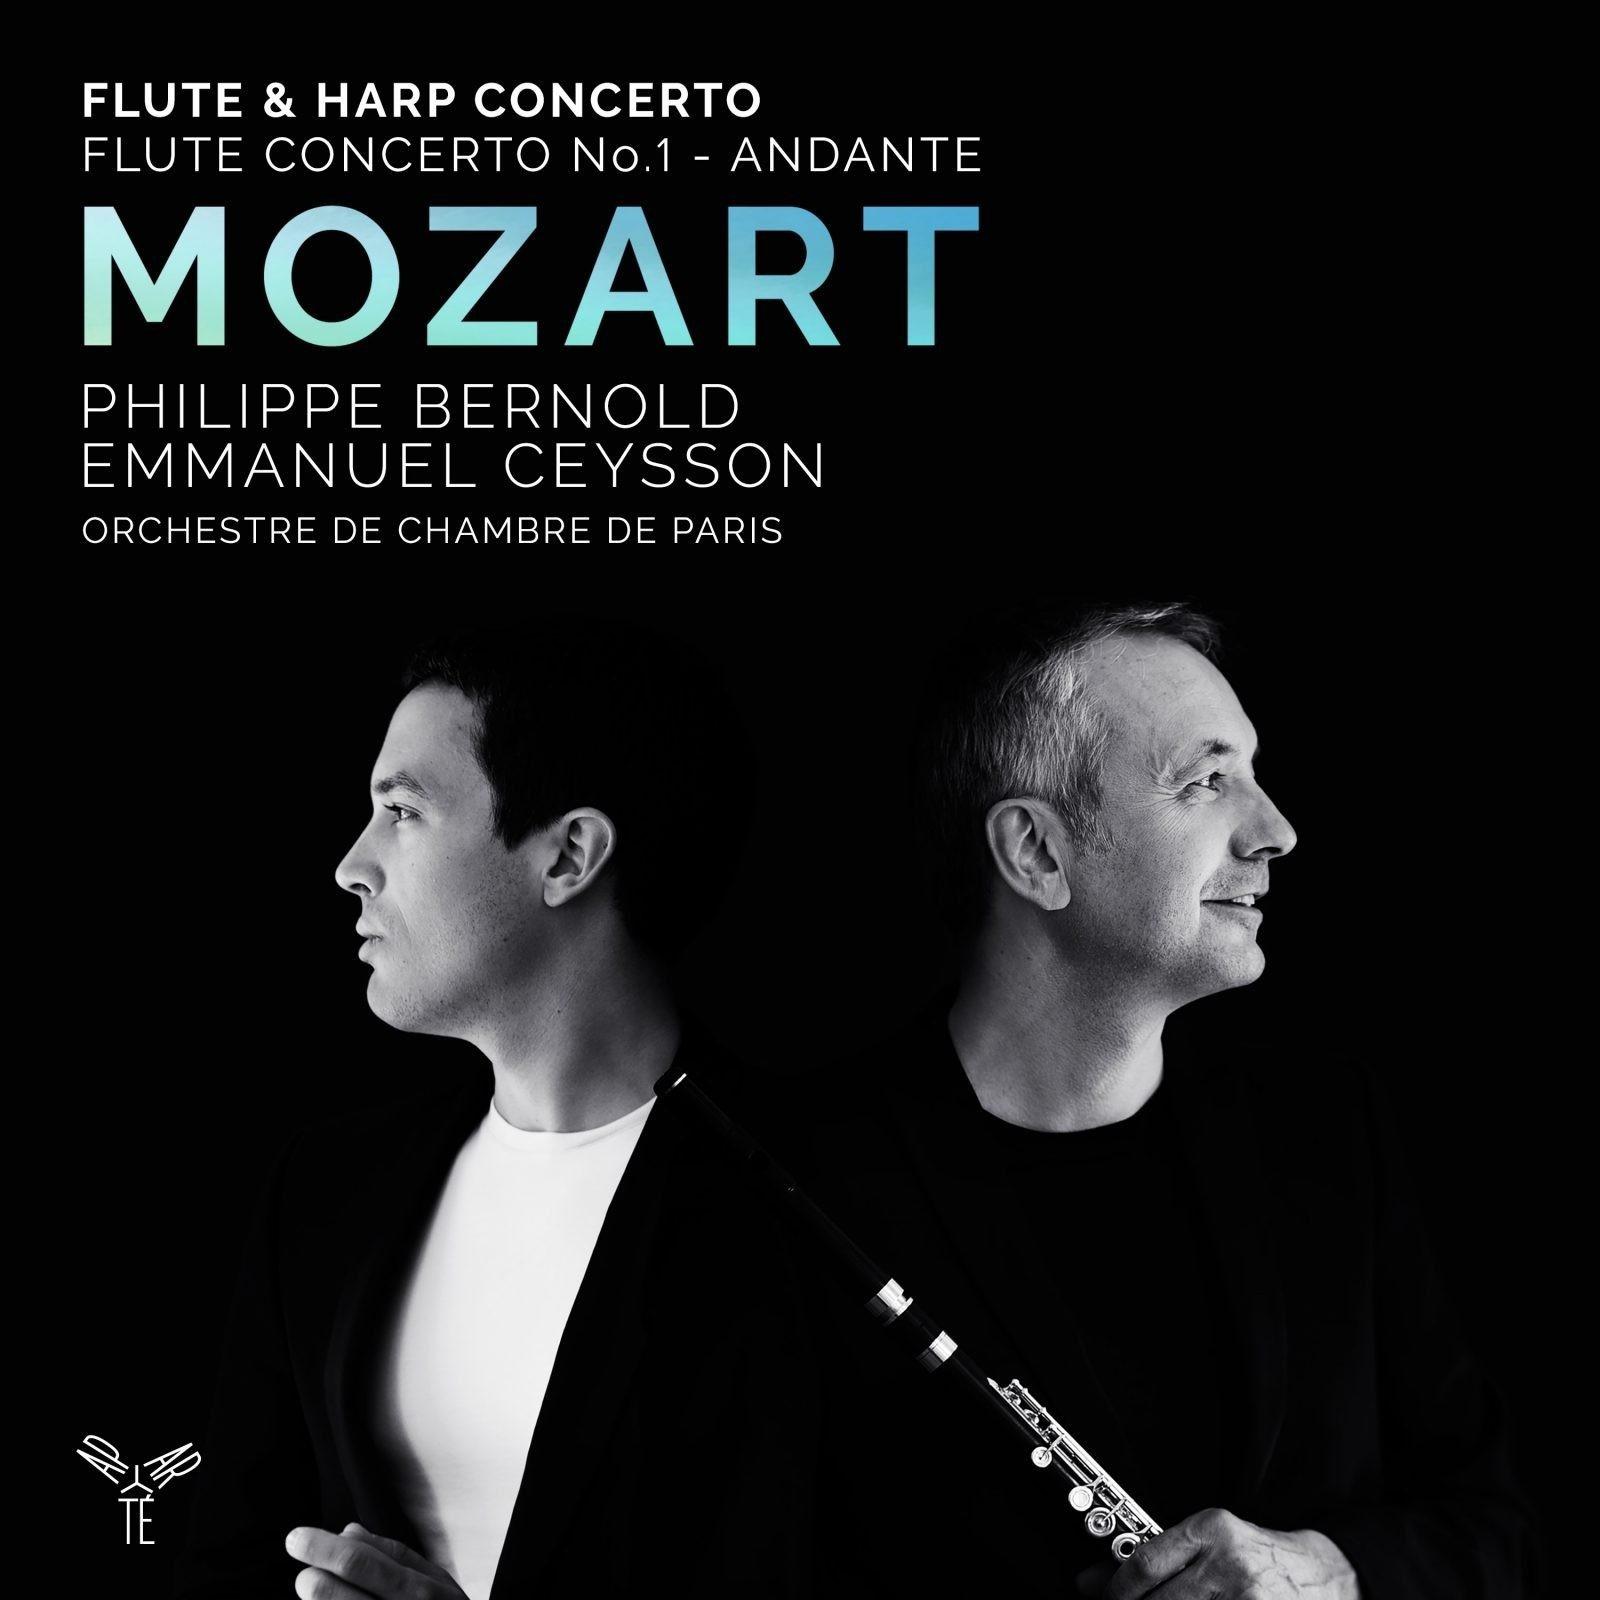 Mozart: Flute & Harp Concerto